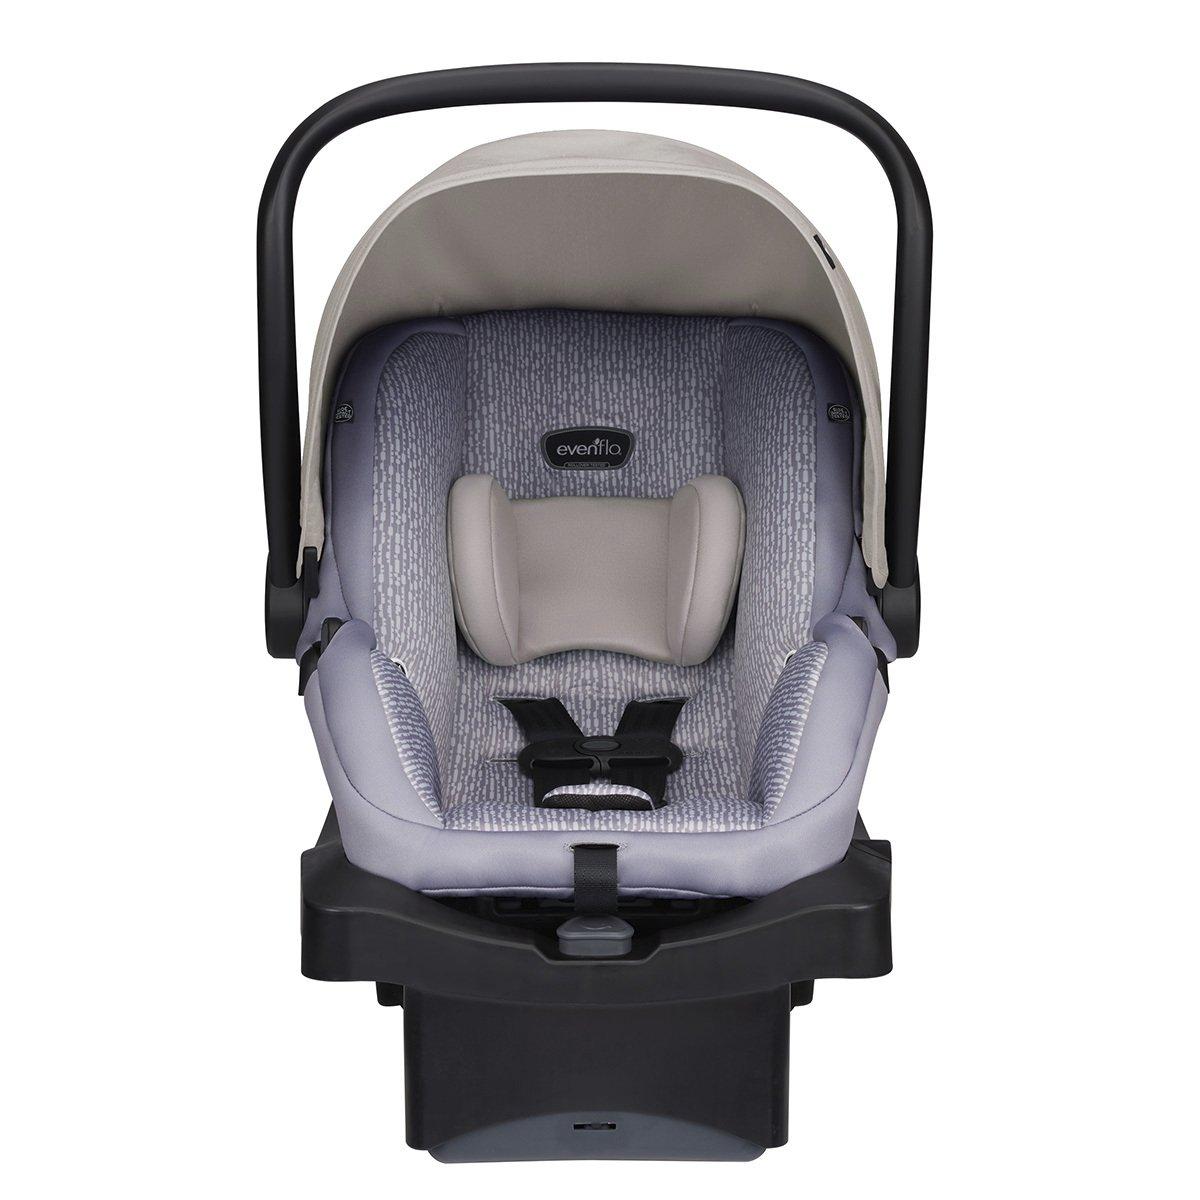 Evenflo Lite Max Best Infant Car Seat